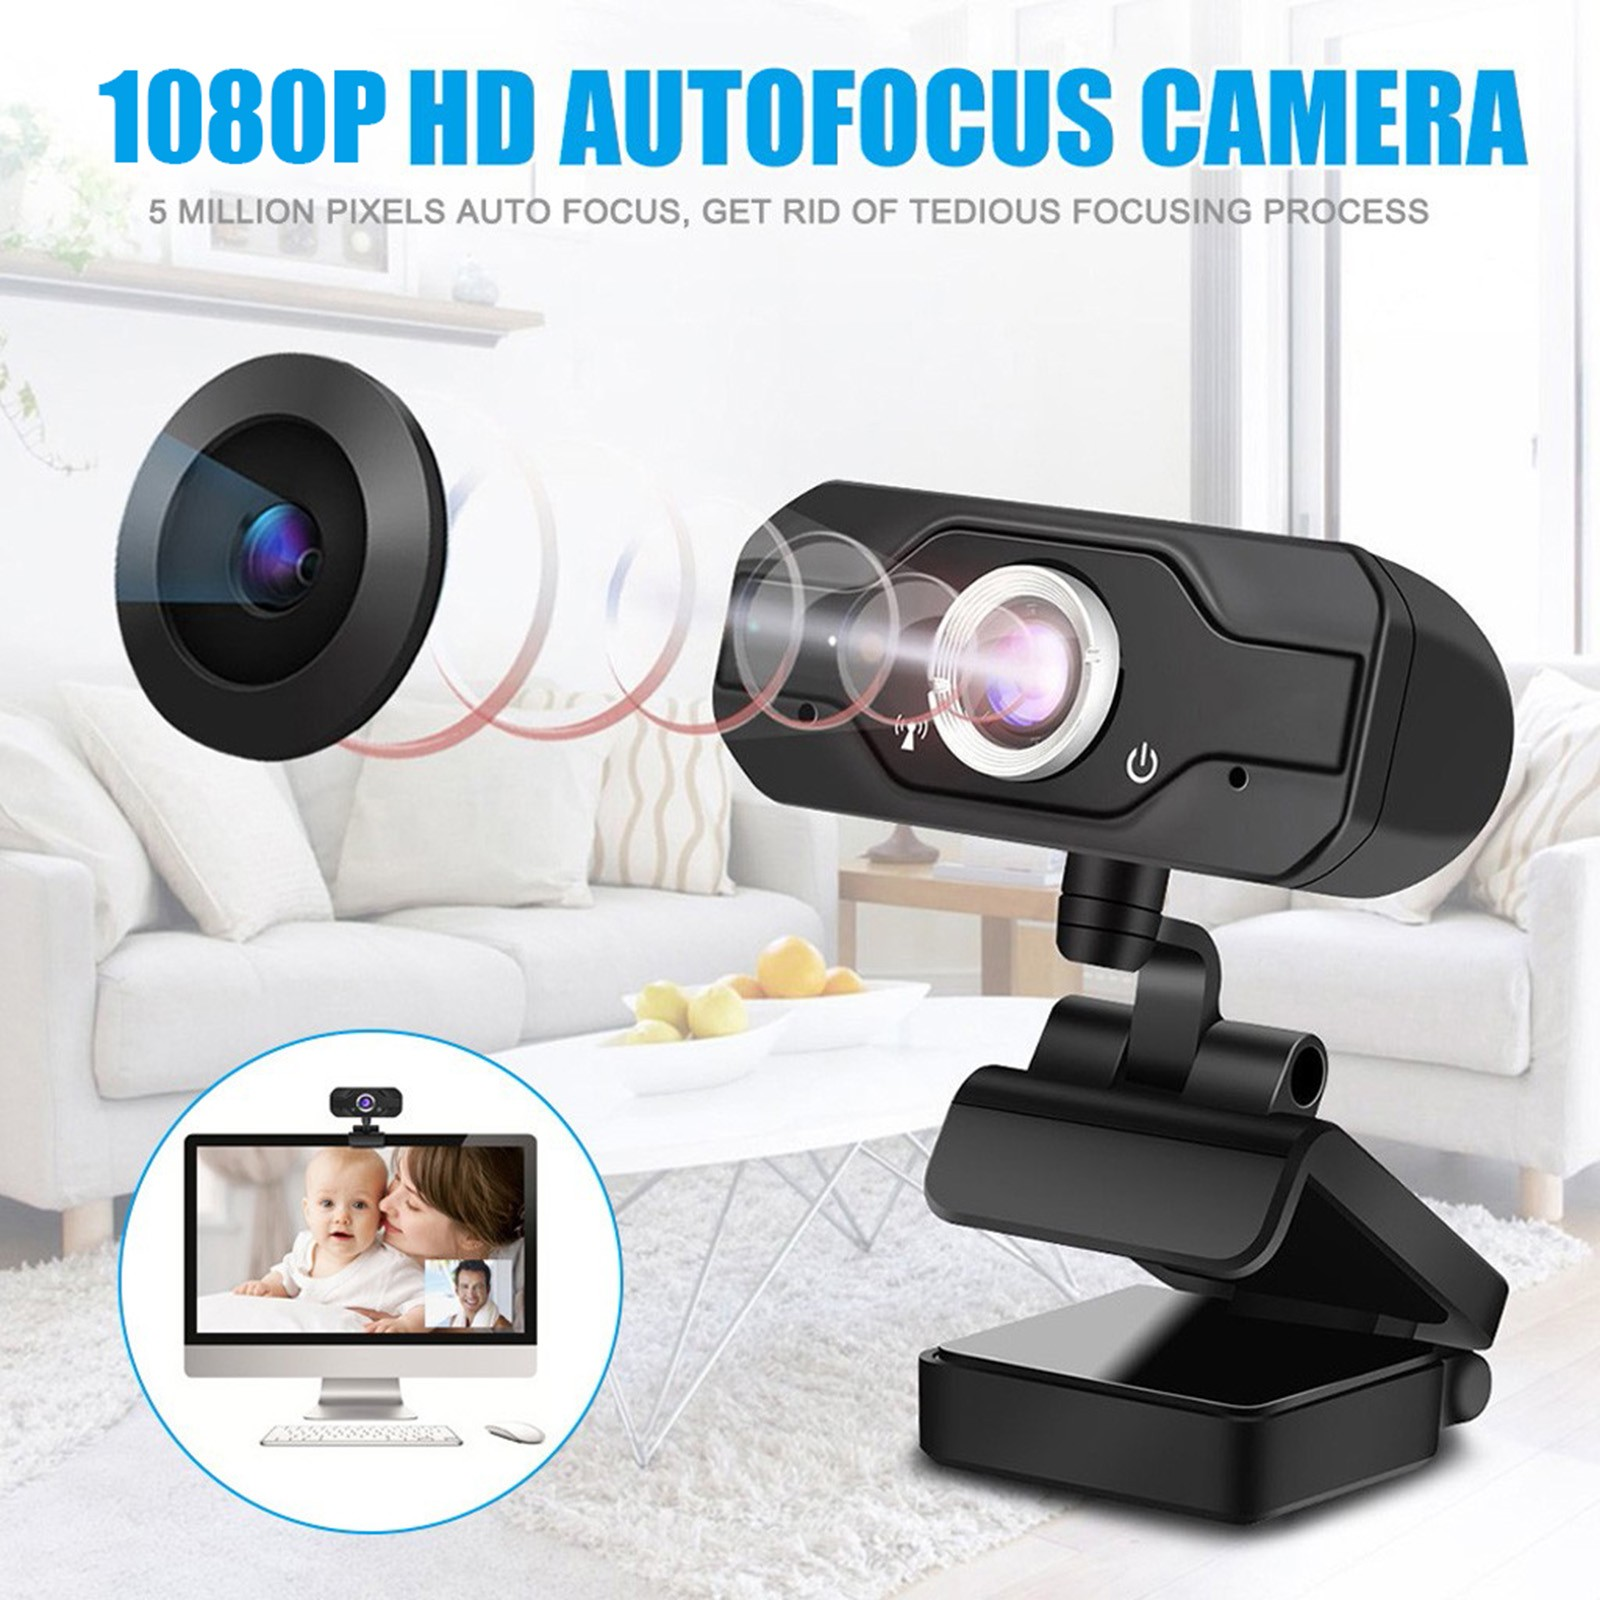 Full Hd 1080p 5 Million Pixel Camera Portable Rotation Angle Adjustable Camera Built-in Mic black